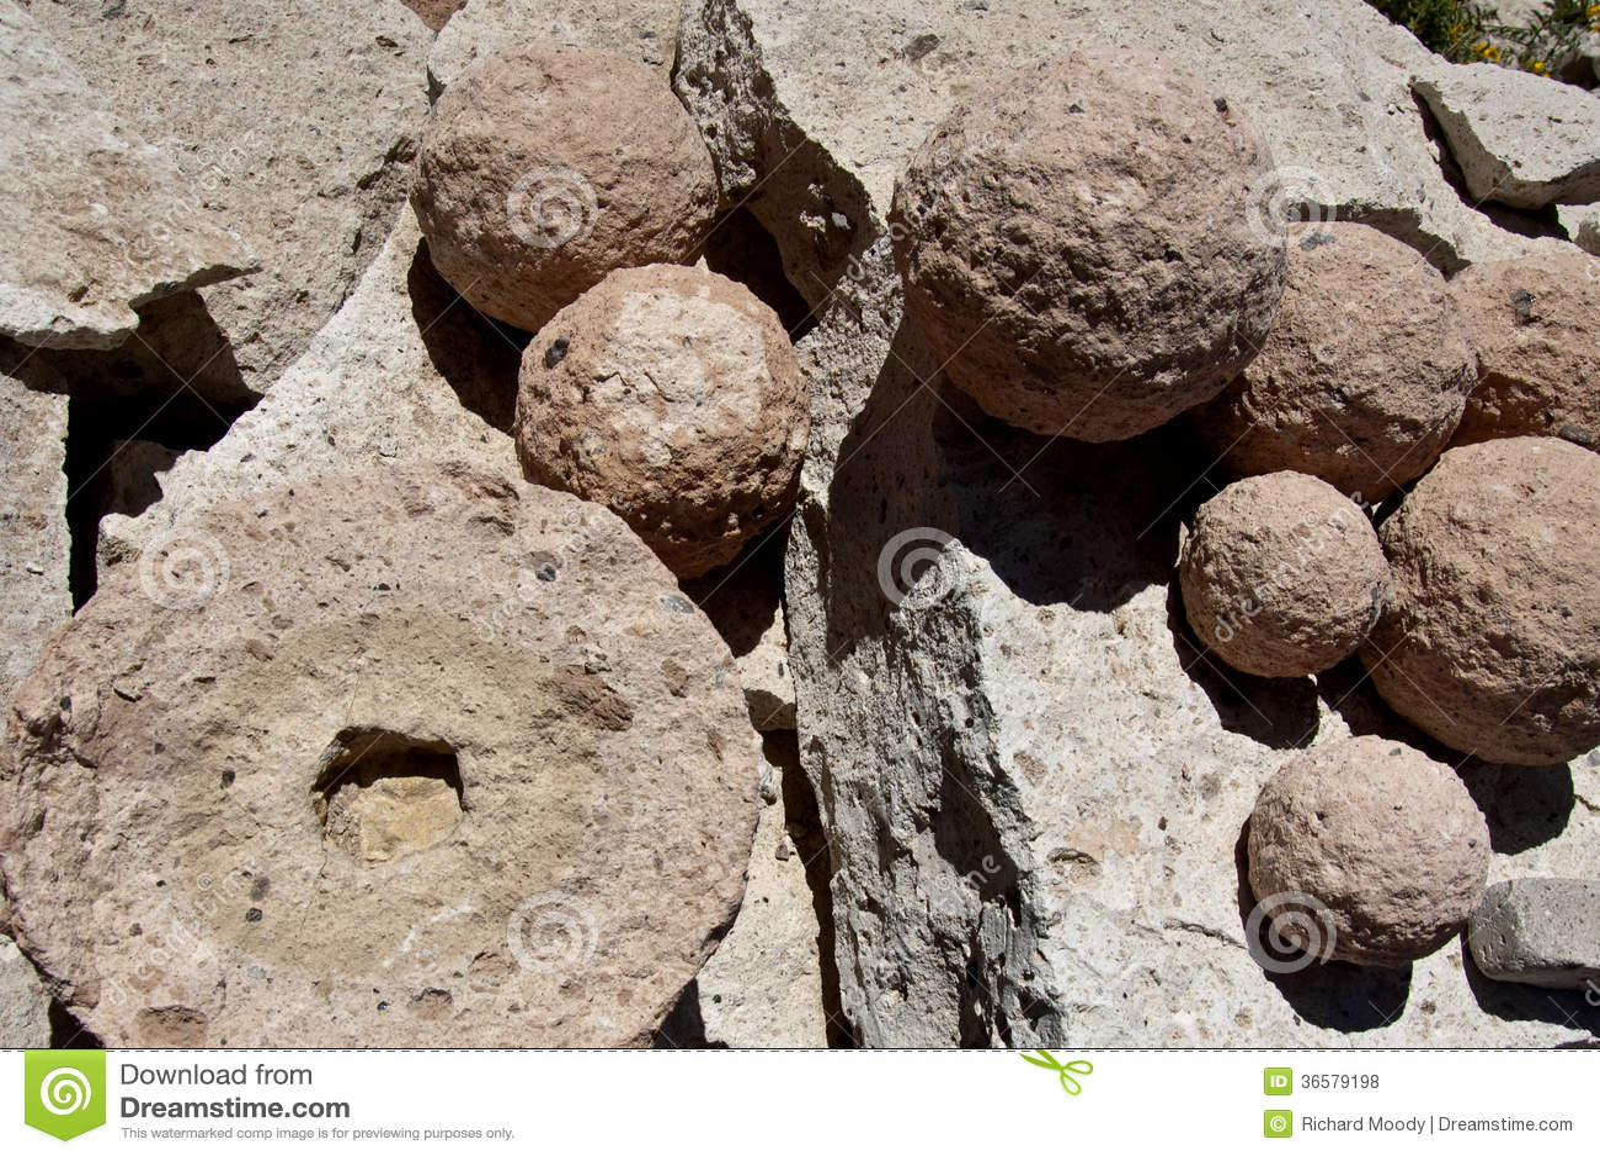 Volcanic Spheres, Sillar Quarry